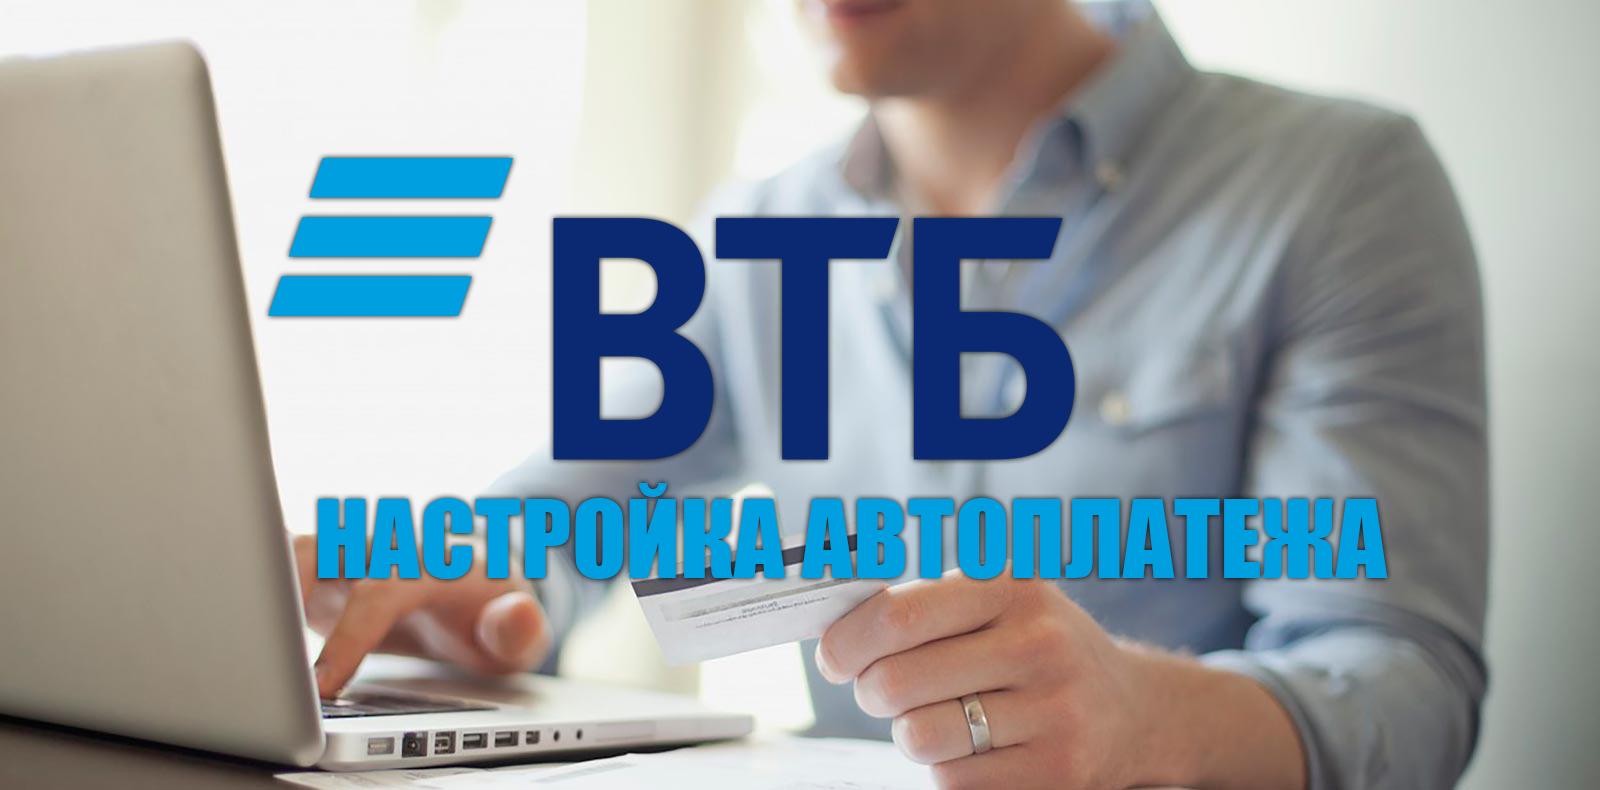 Автоматическая оплата услуг через ВТБ Онлайн